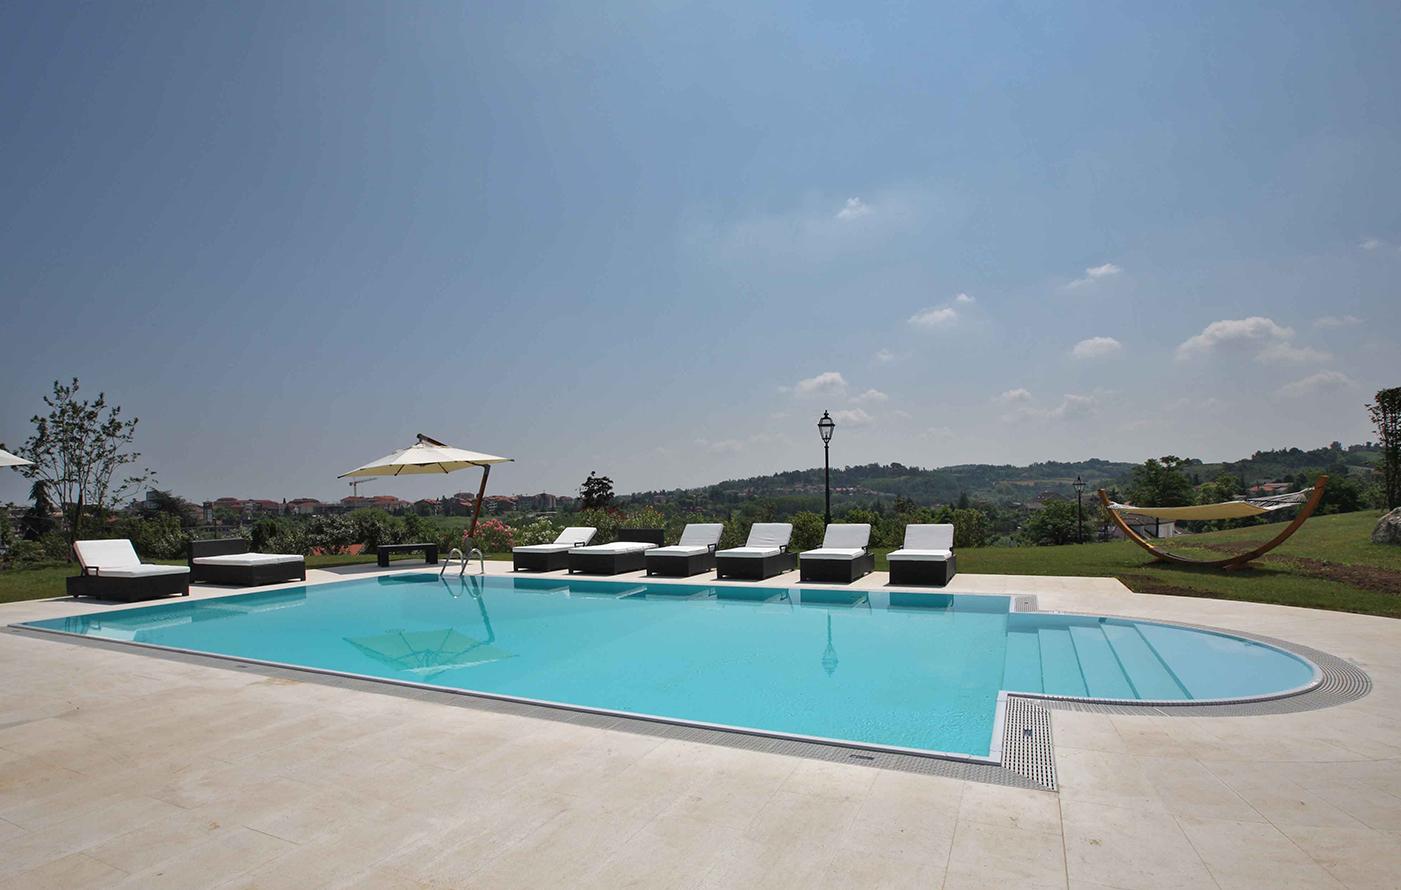 agriverde-scala-romana-piscina-01